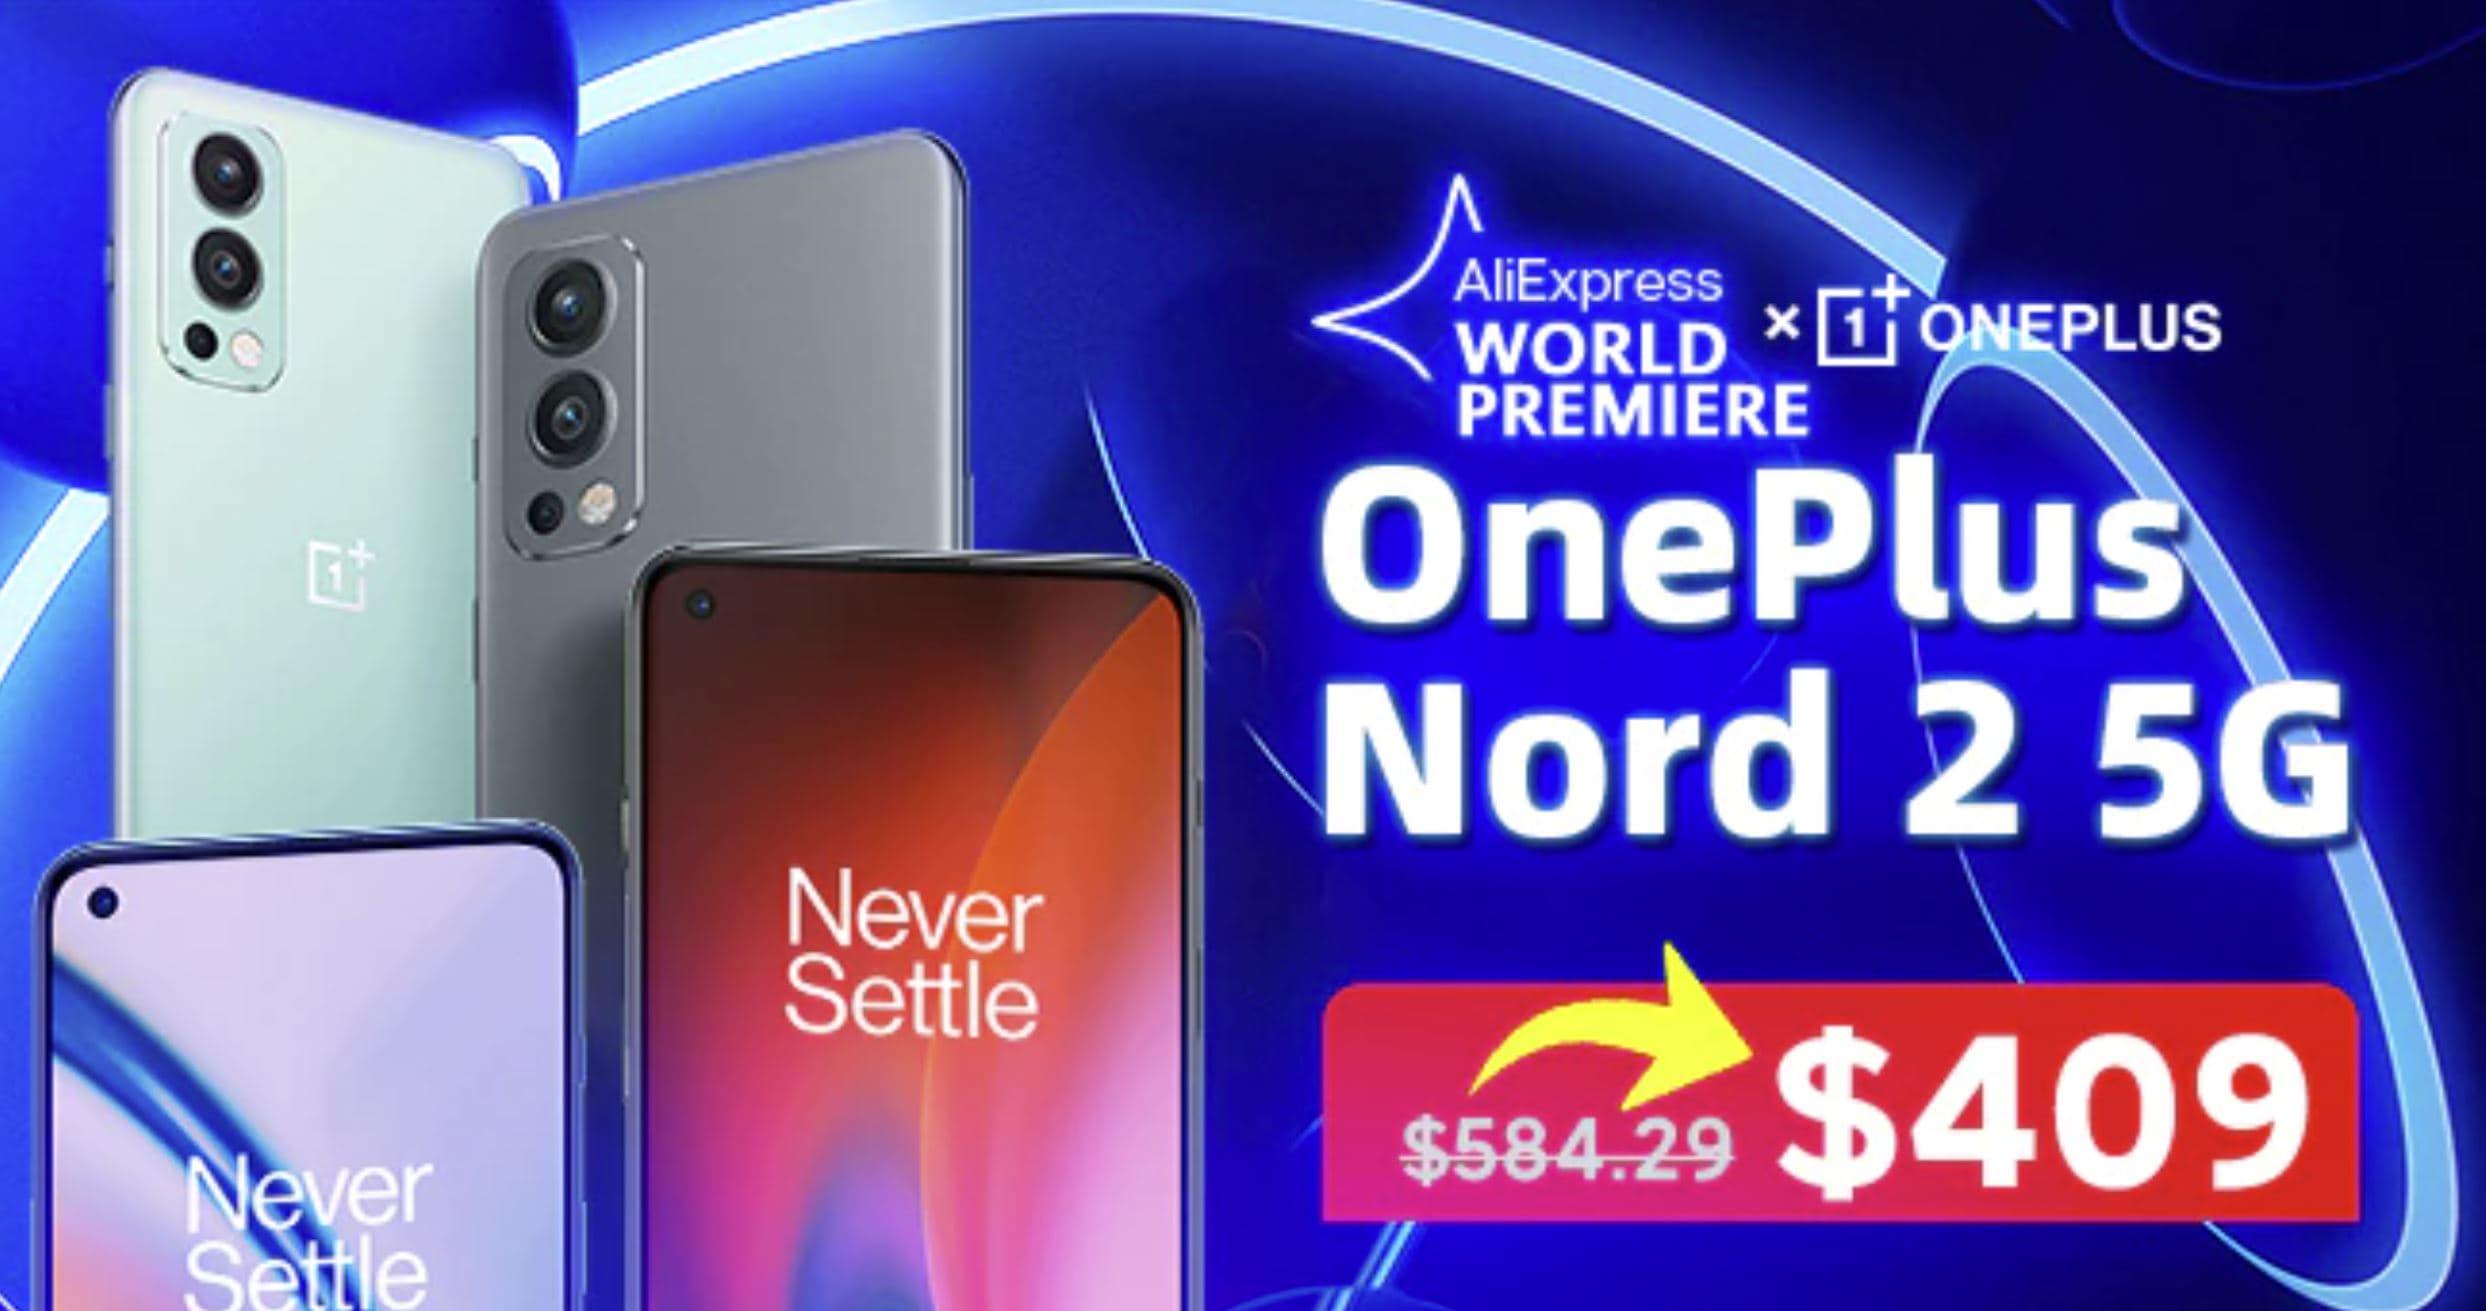 OnePlus Nord 2 5G price